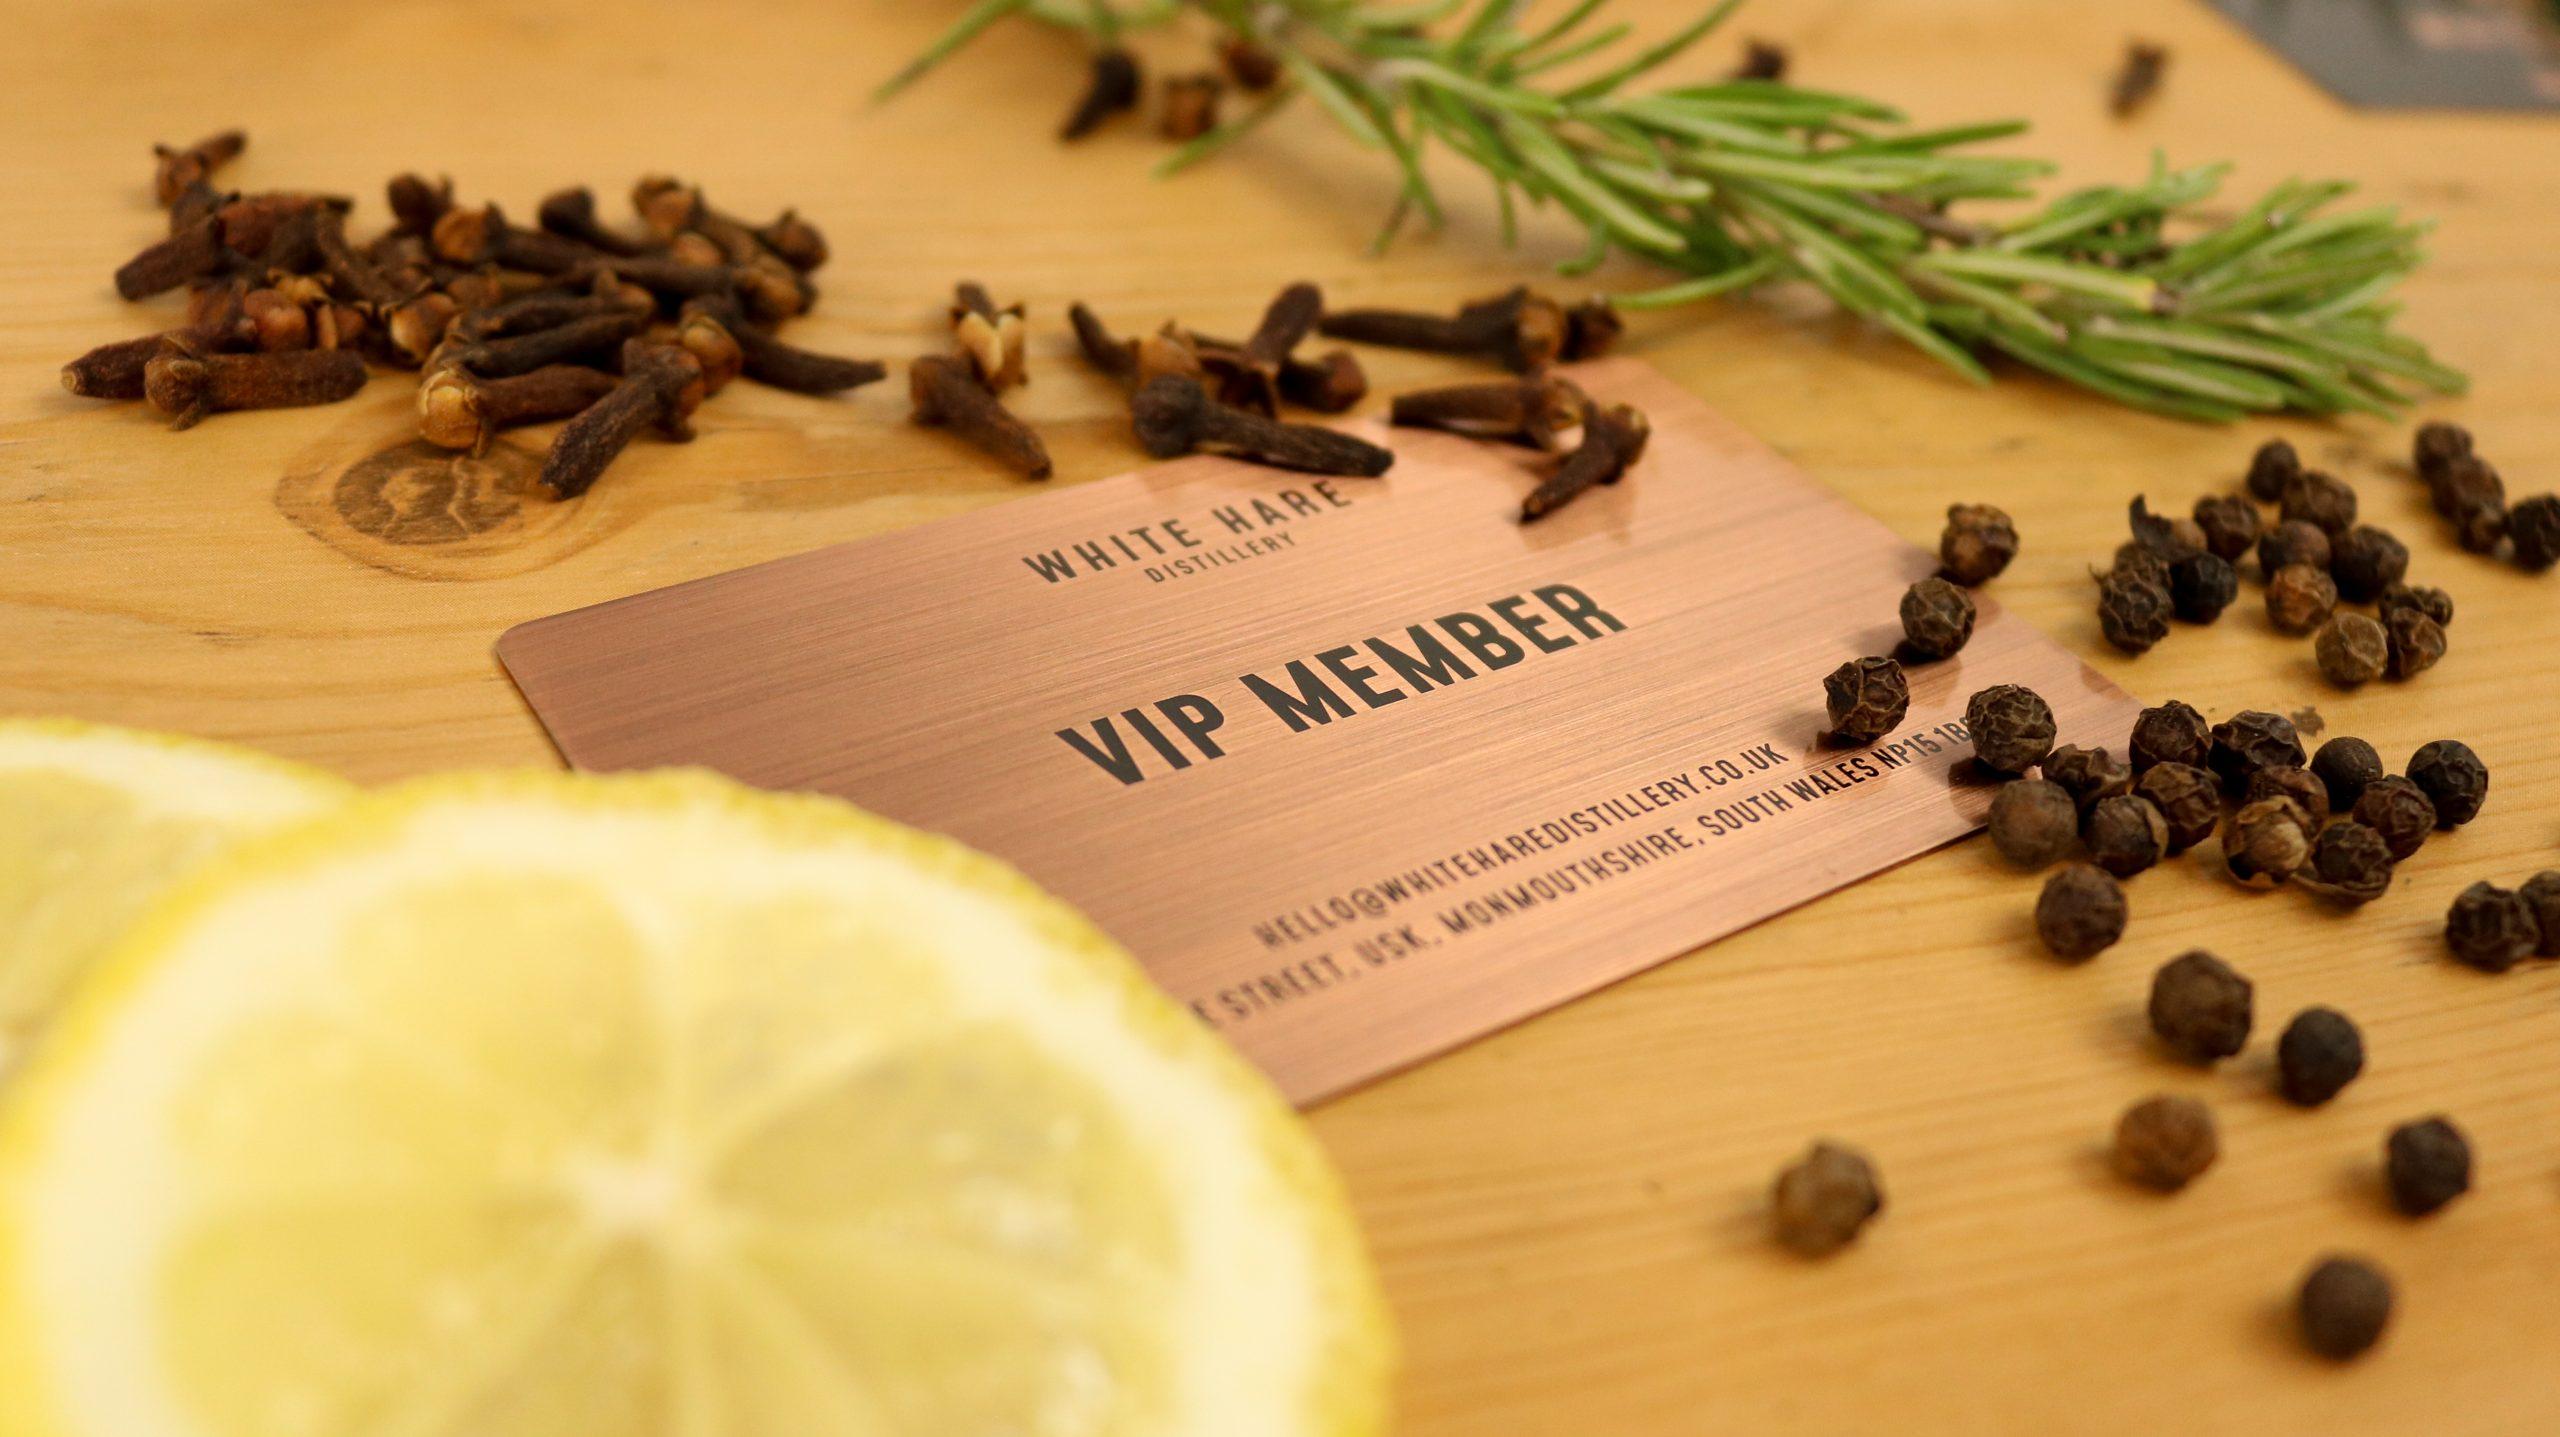 White Hare Distillery - Metal Membership Cards